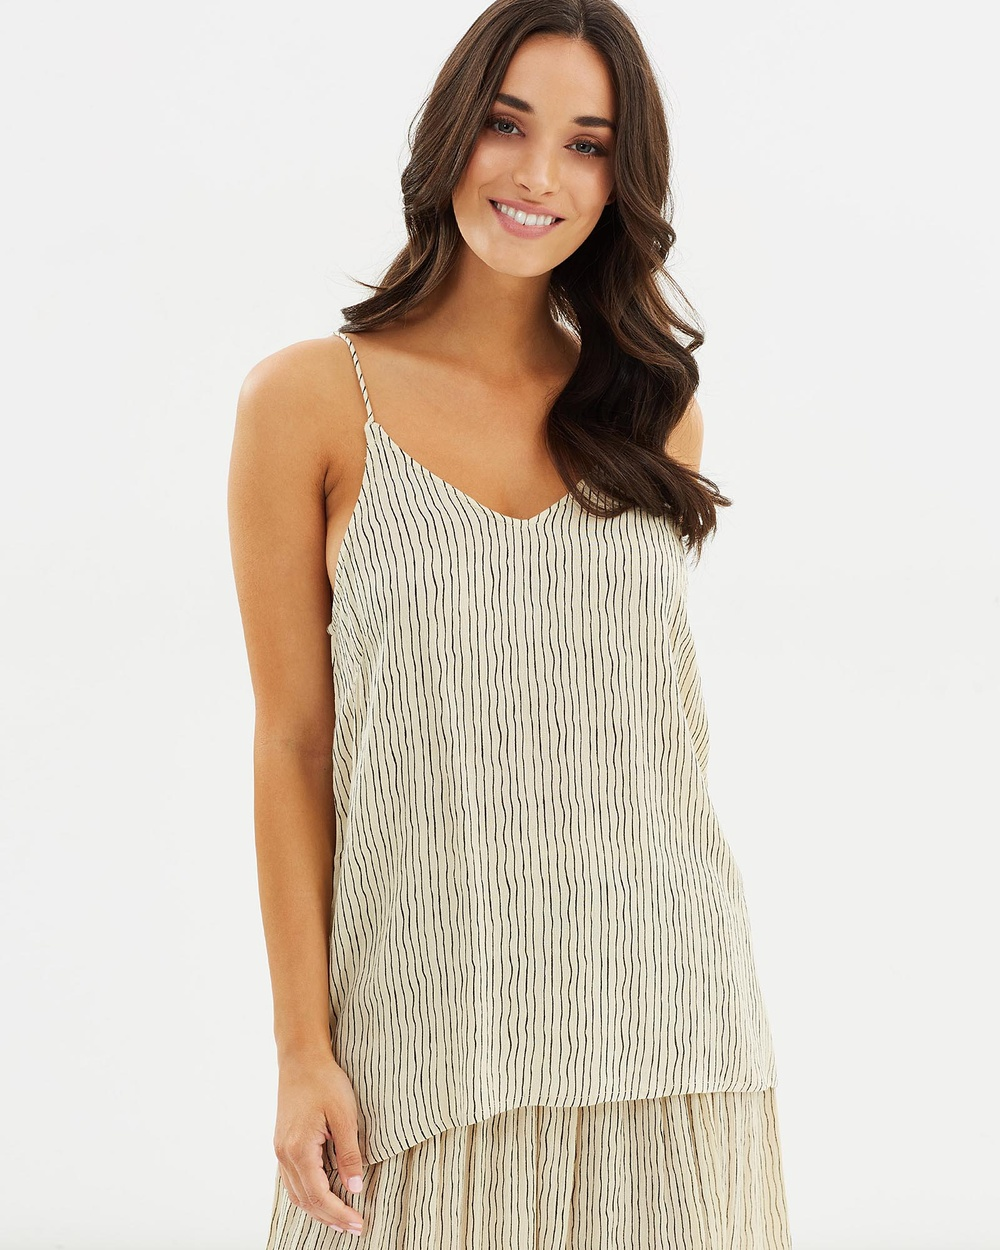 Kaja Clothing Kendall Camisole Tops Chamomile  Kendall Camisole